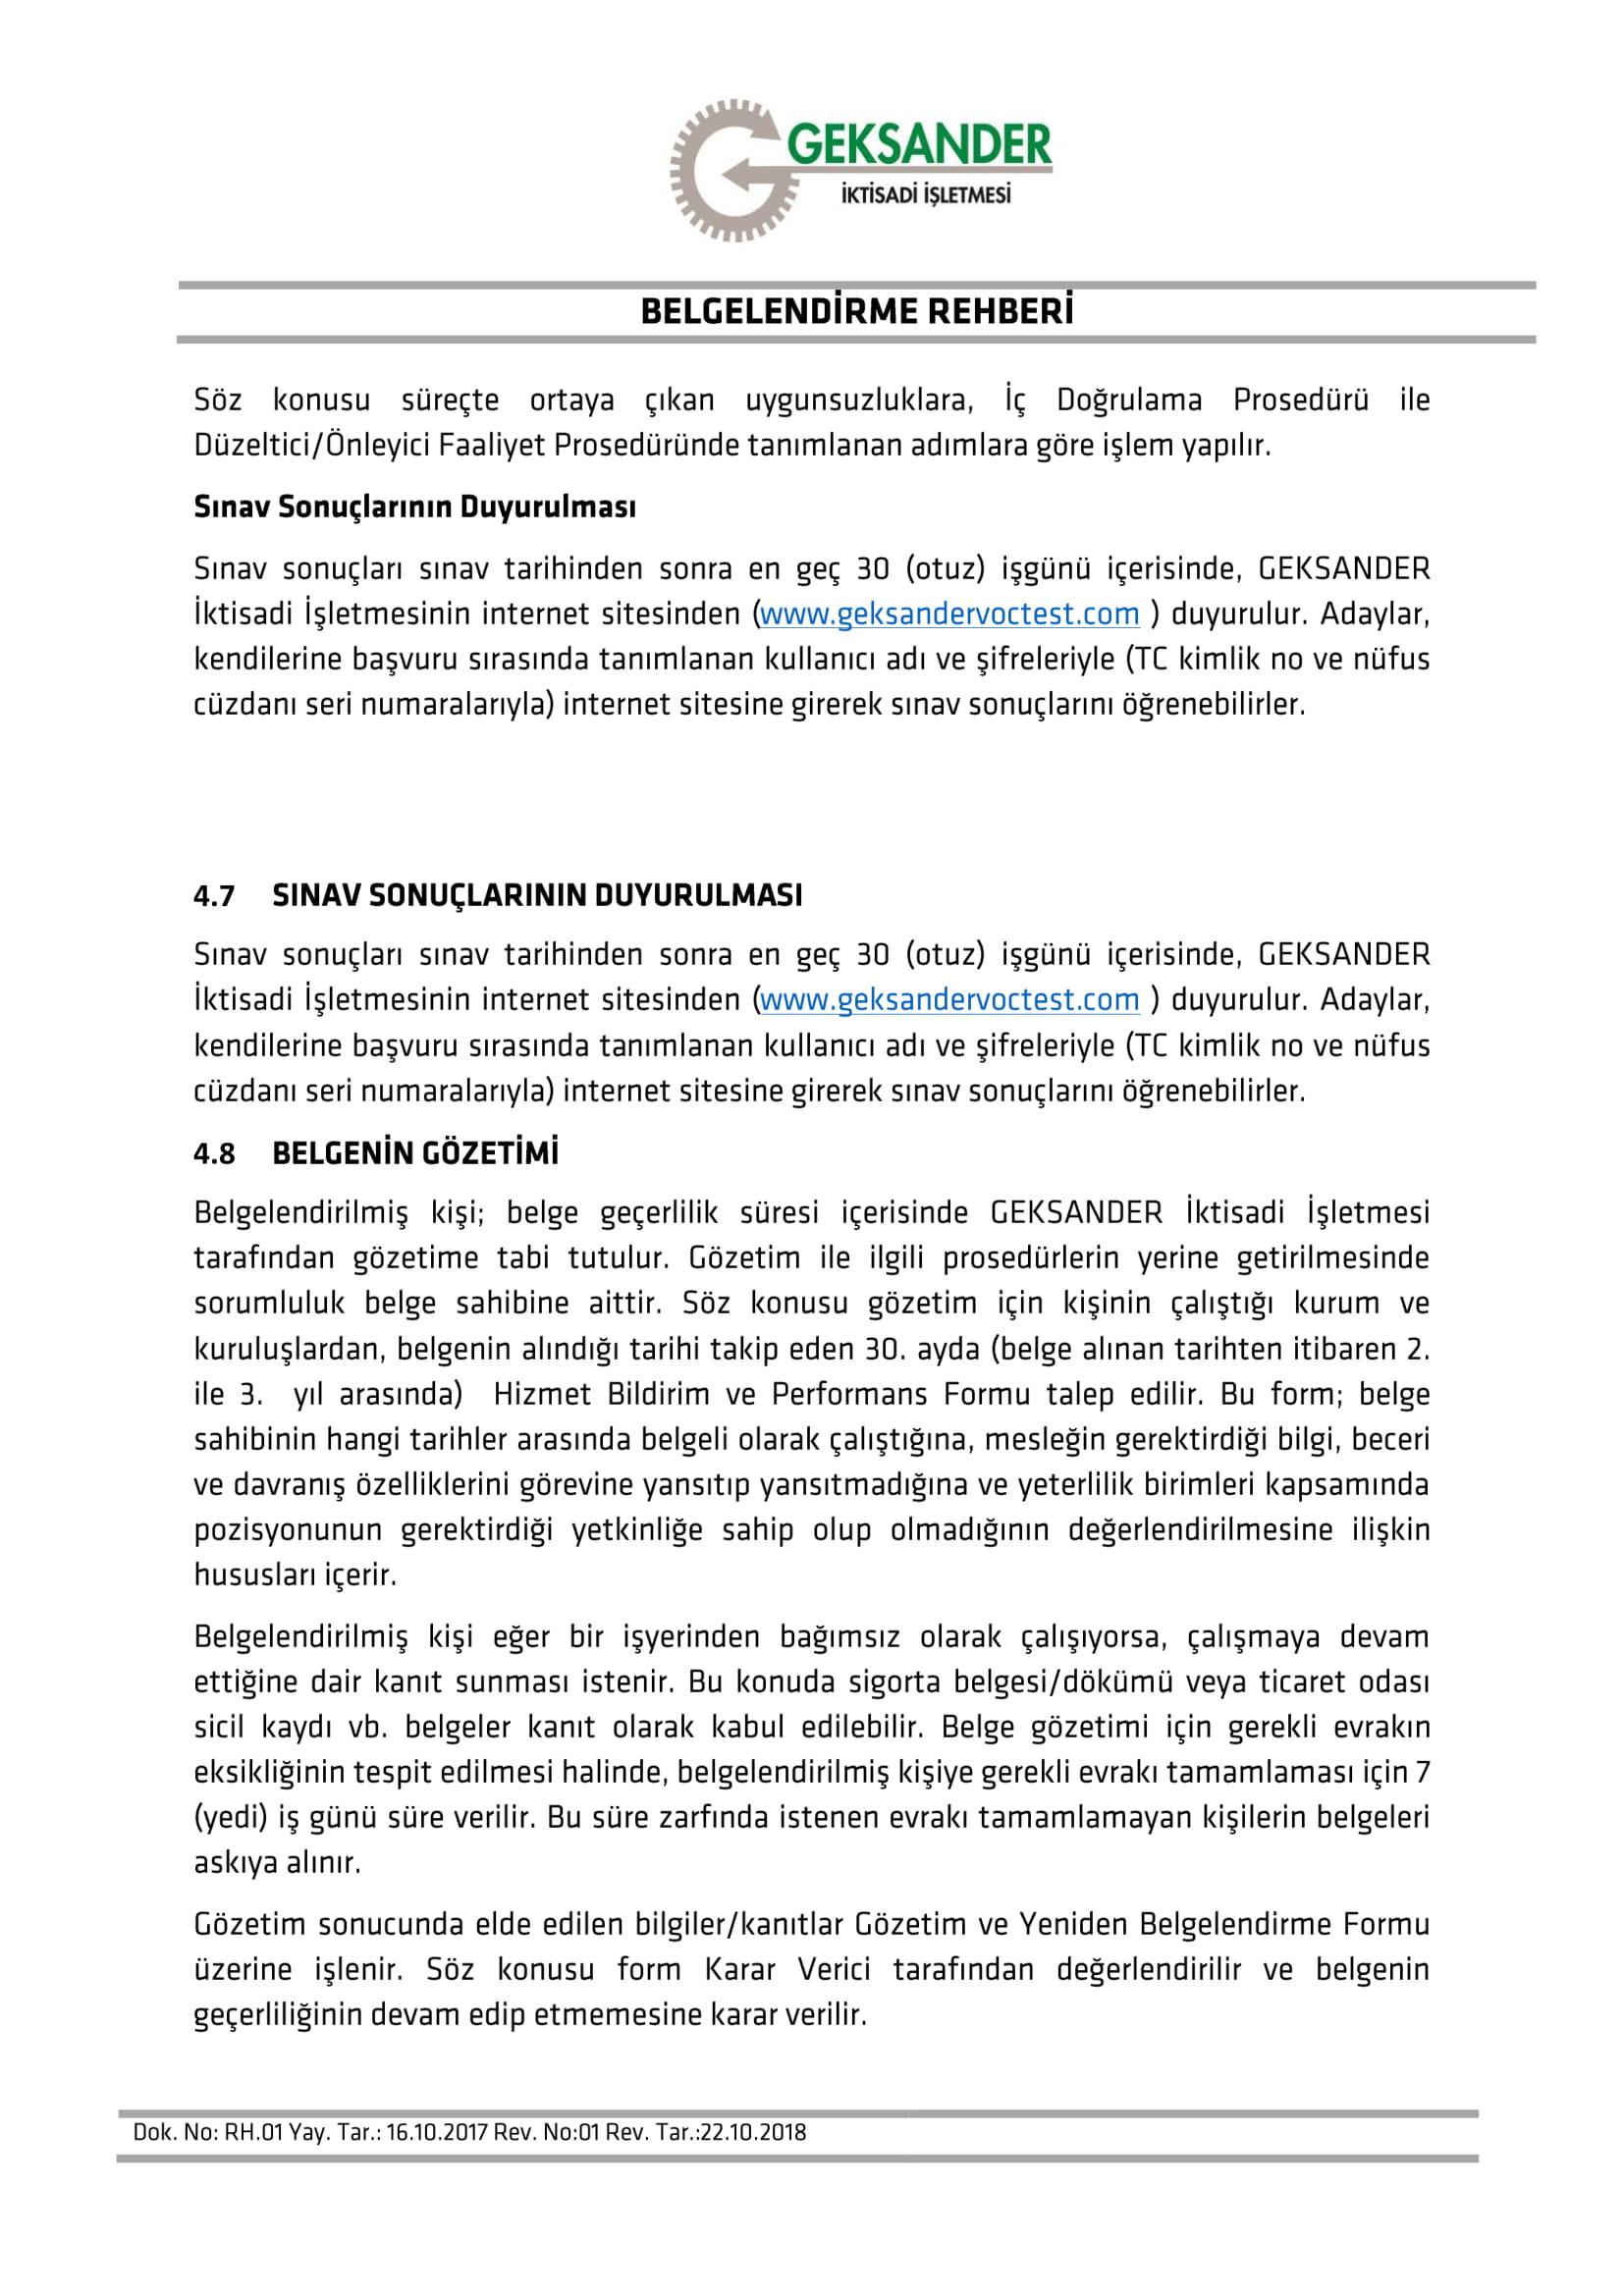 RH.-01-Belgelendirme-Rehberi-REV01[1]-07